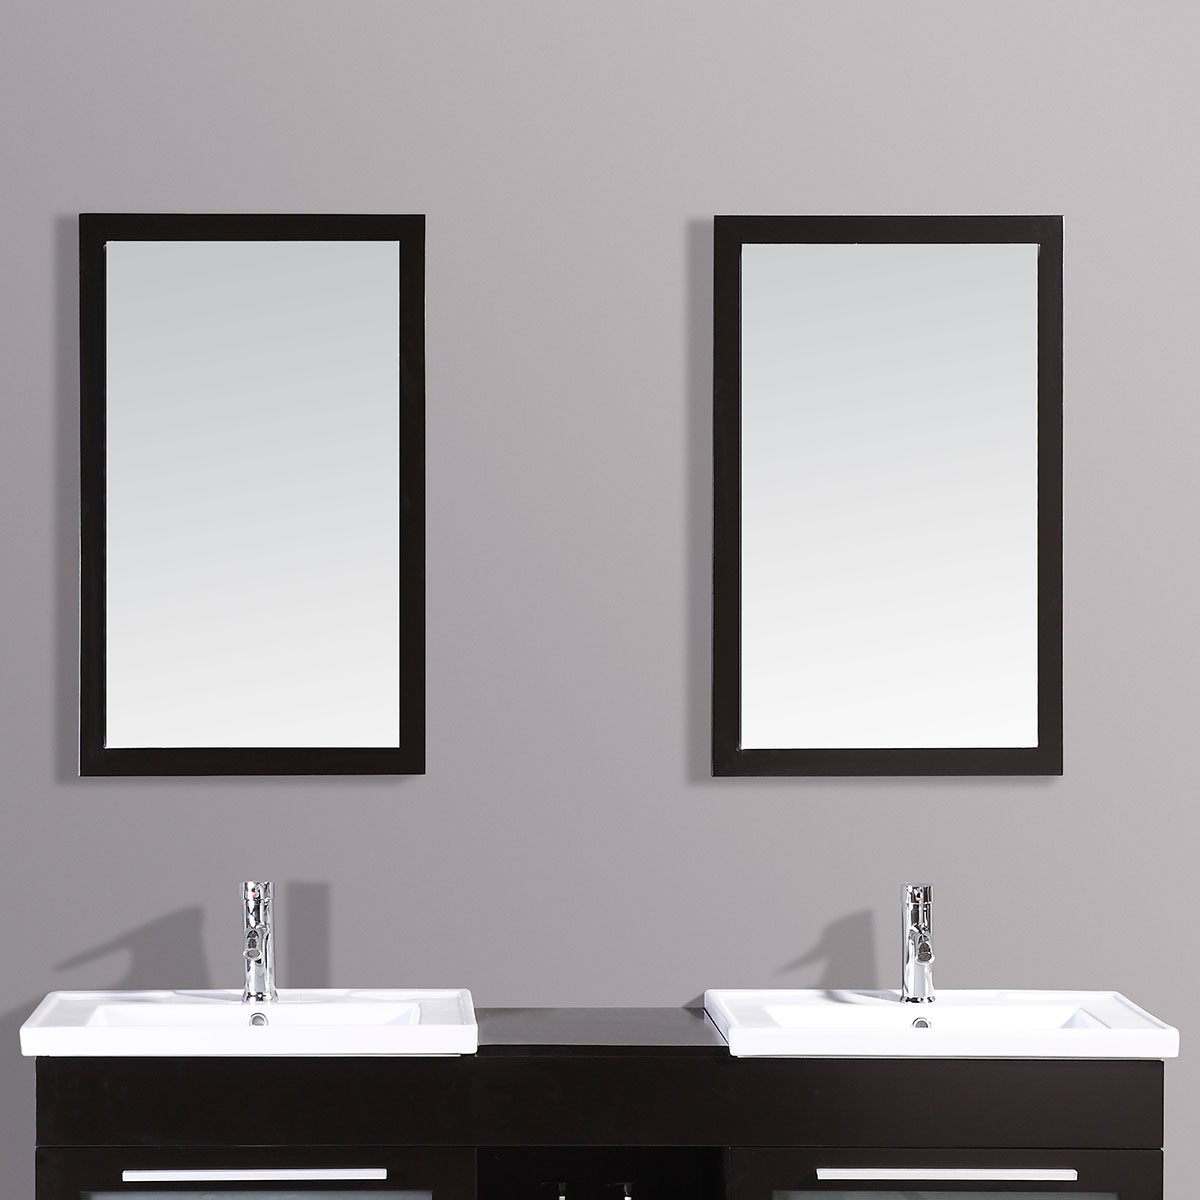 24 x 31 In. Mirror with Espresso Frame (DK-T9118-M)